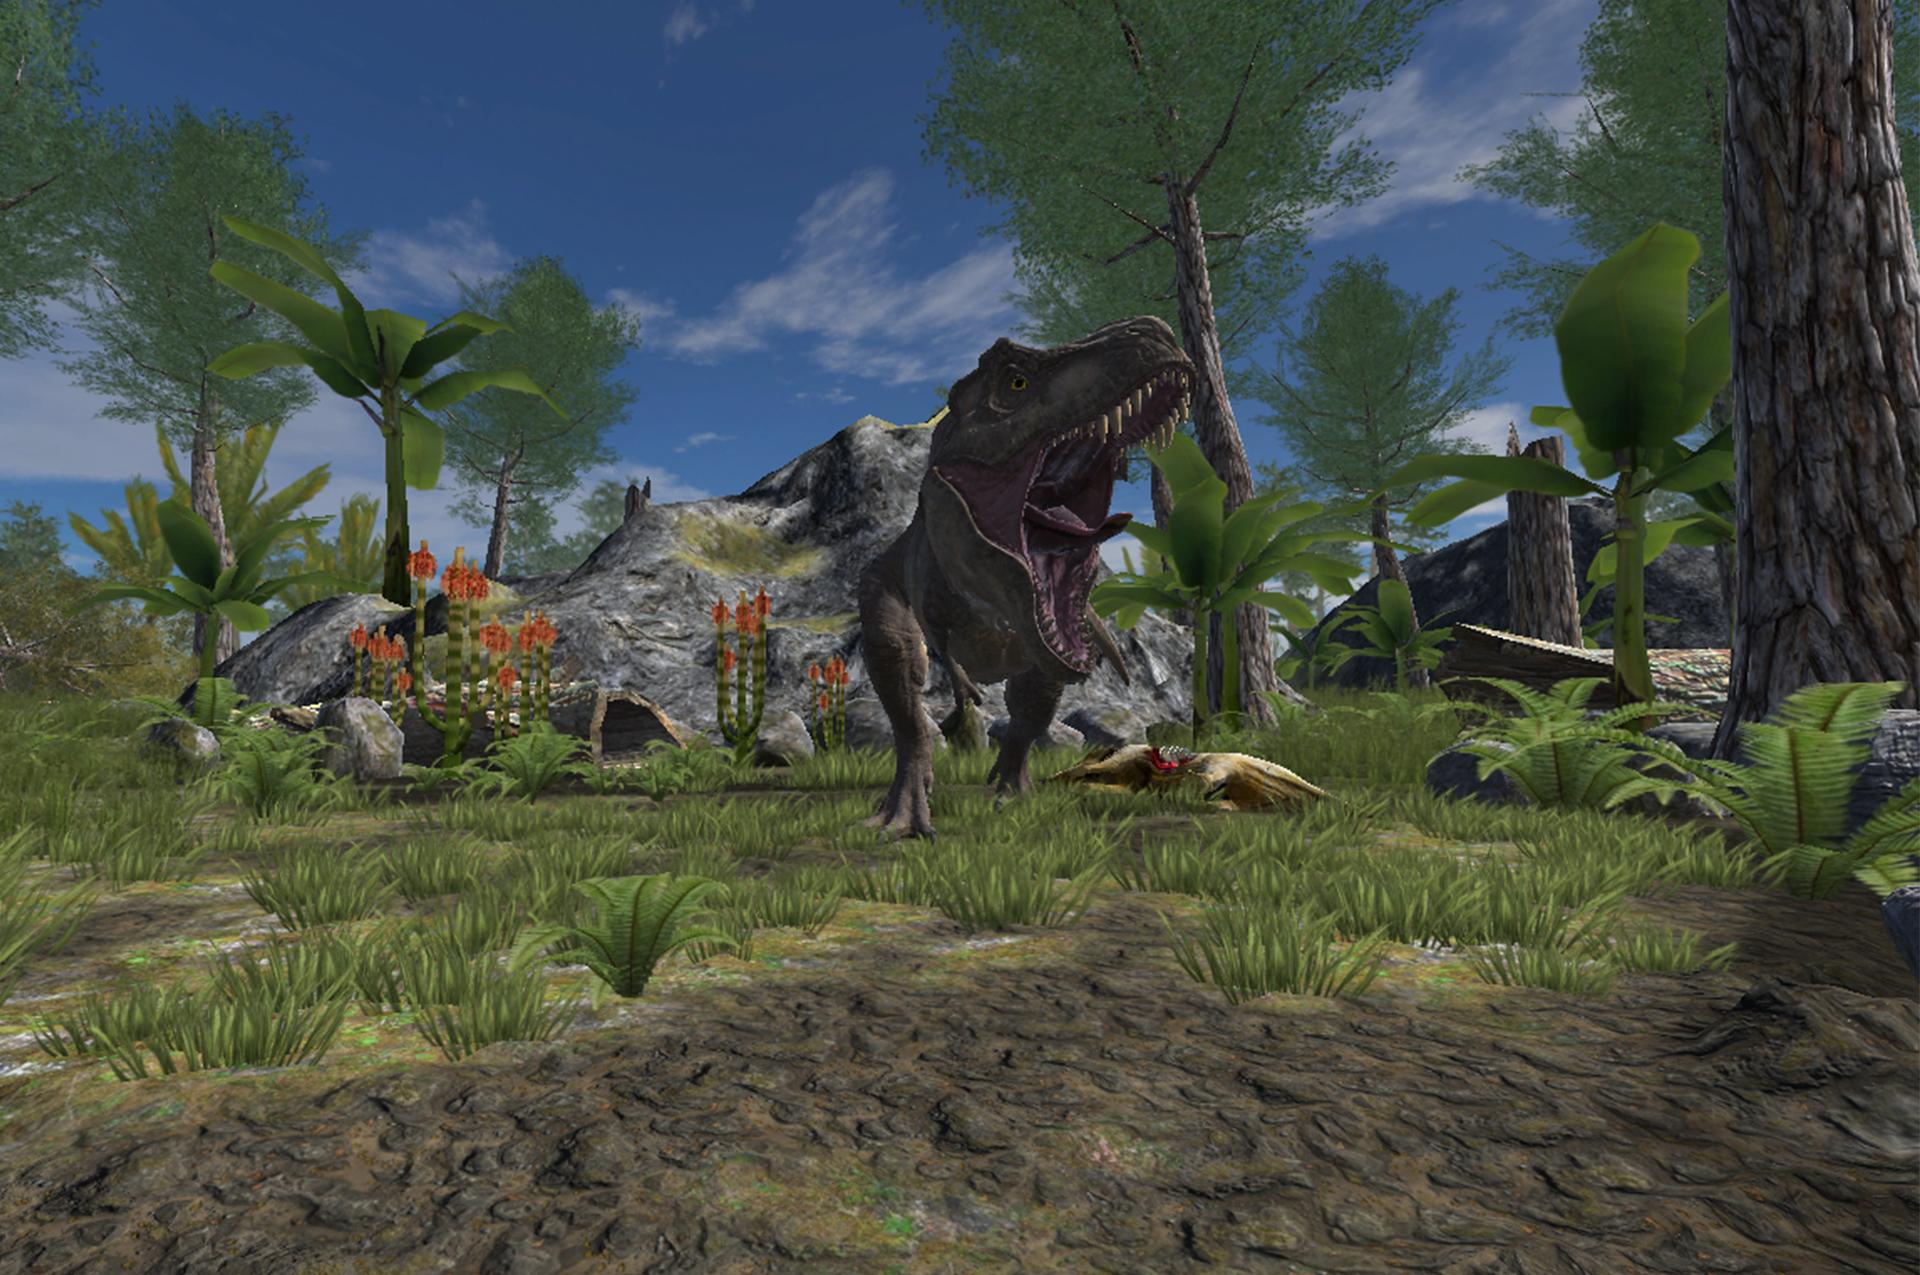 Avatarmedia_Portfolio_DinoPark_Projekt-detail_Slide_v01-05